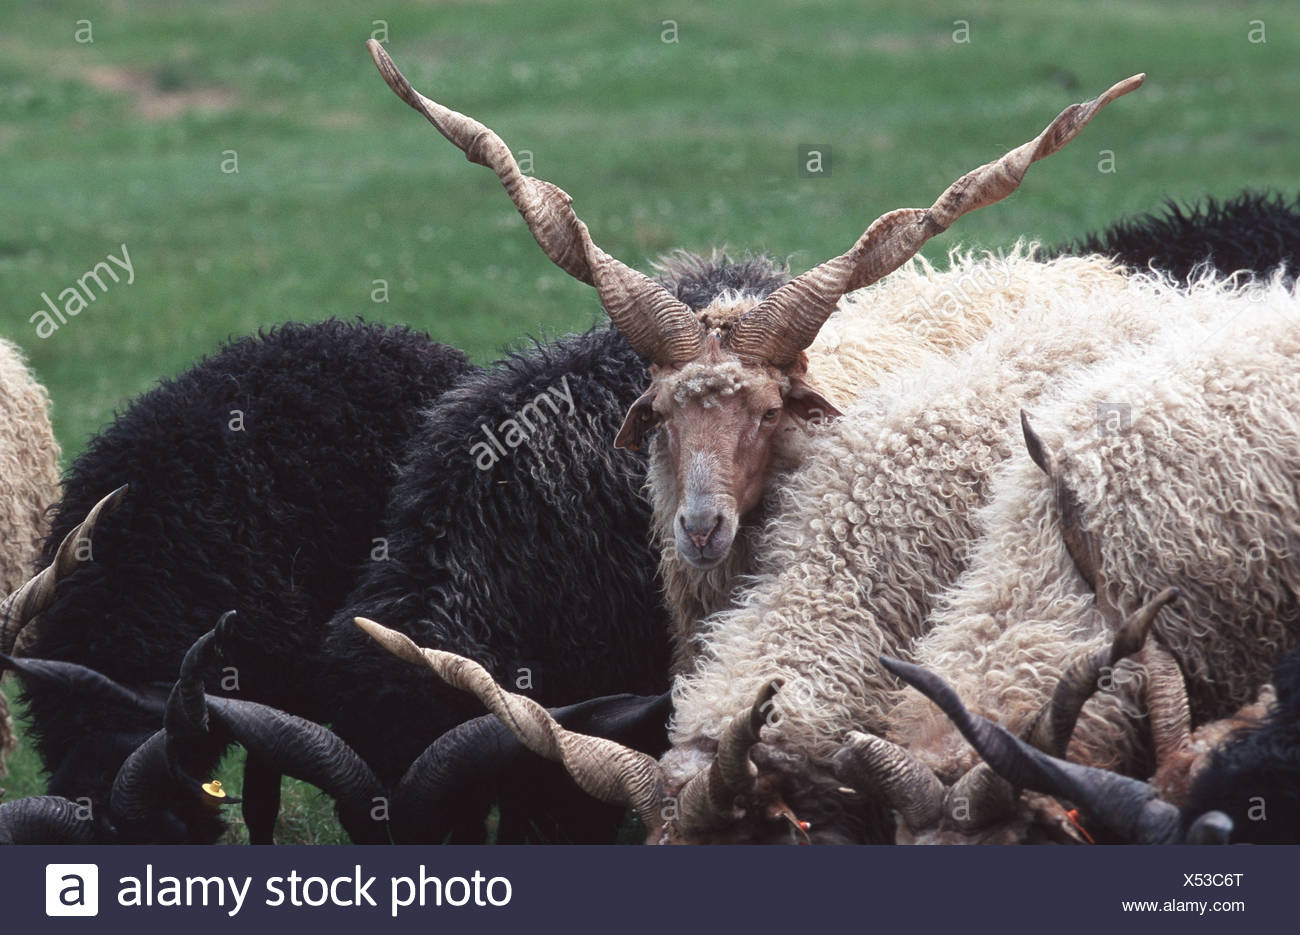 Walachian (Ovis ammon f. aries), old breed of sheep, Hungary - Stock Image